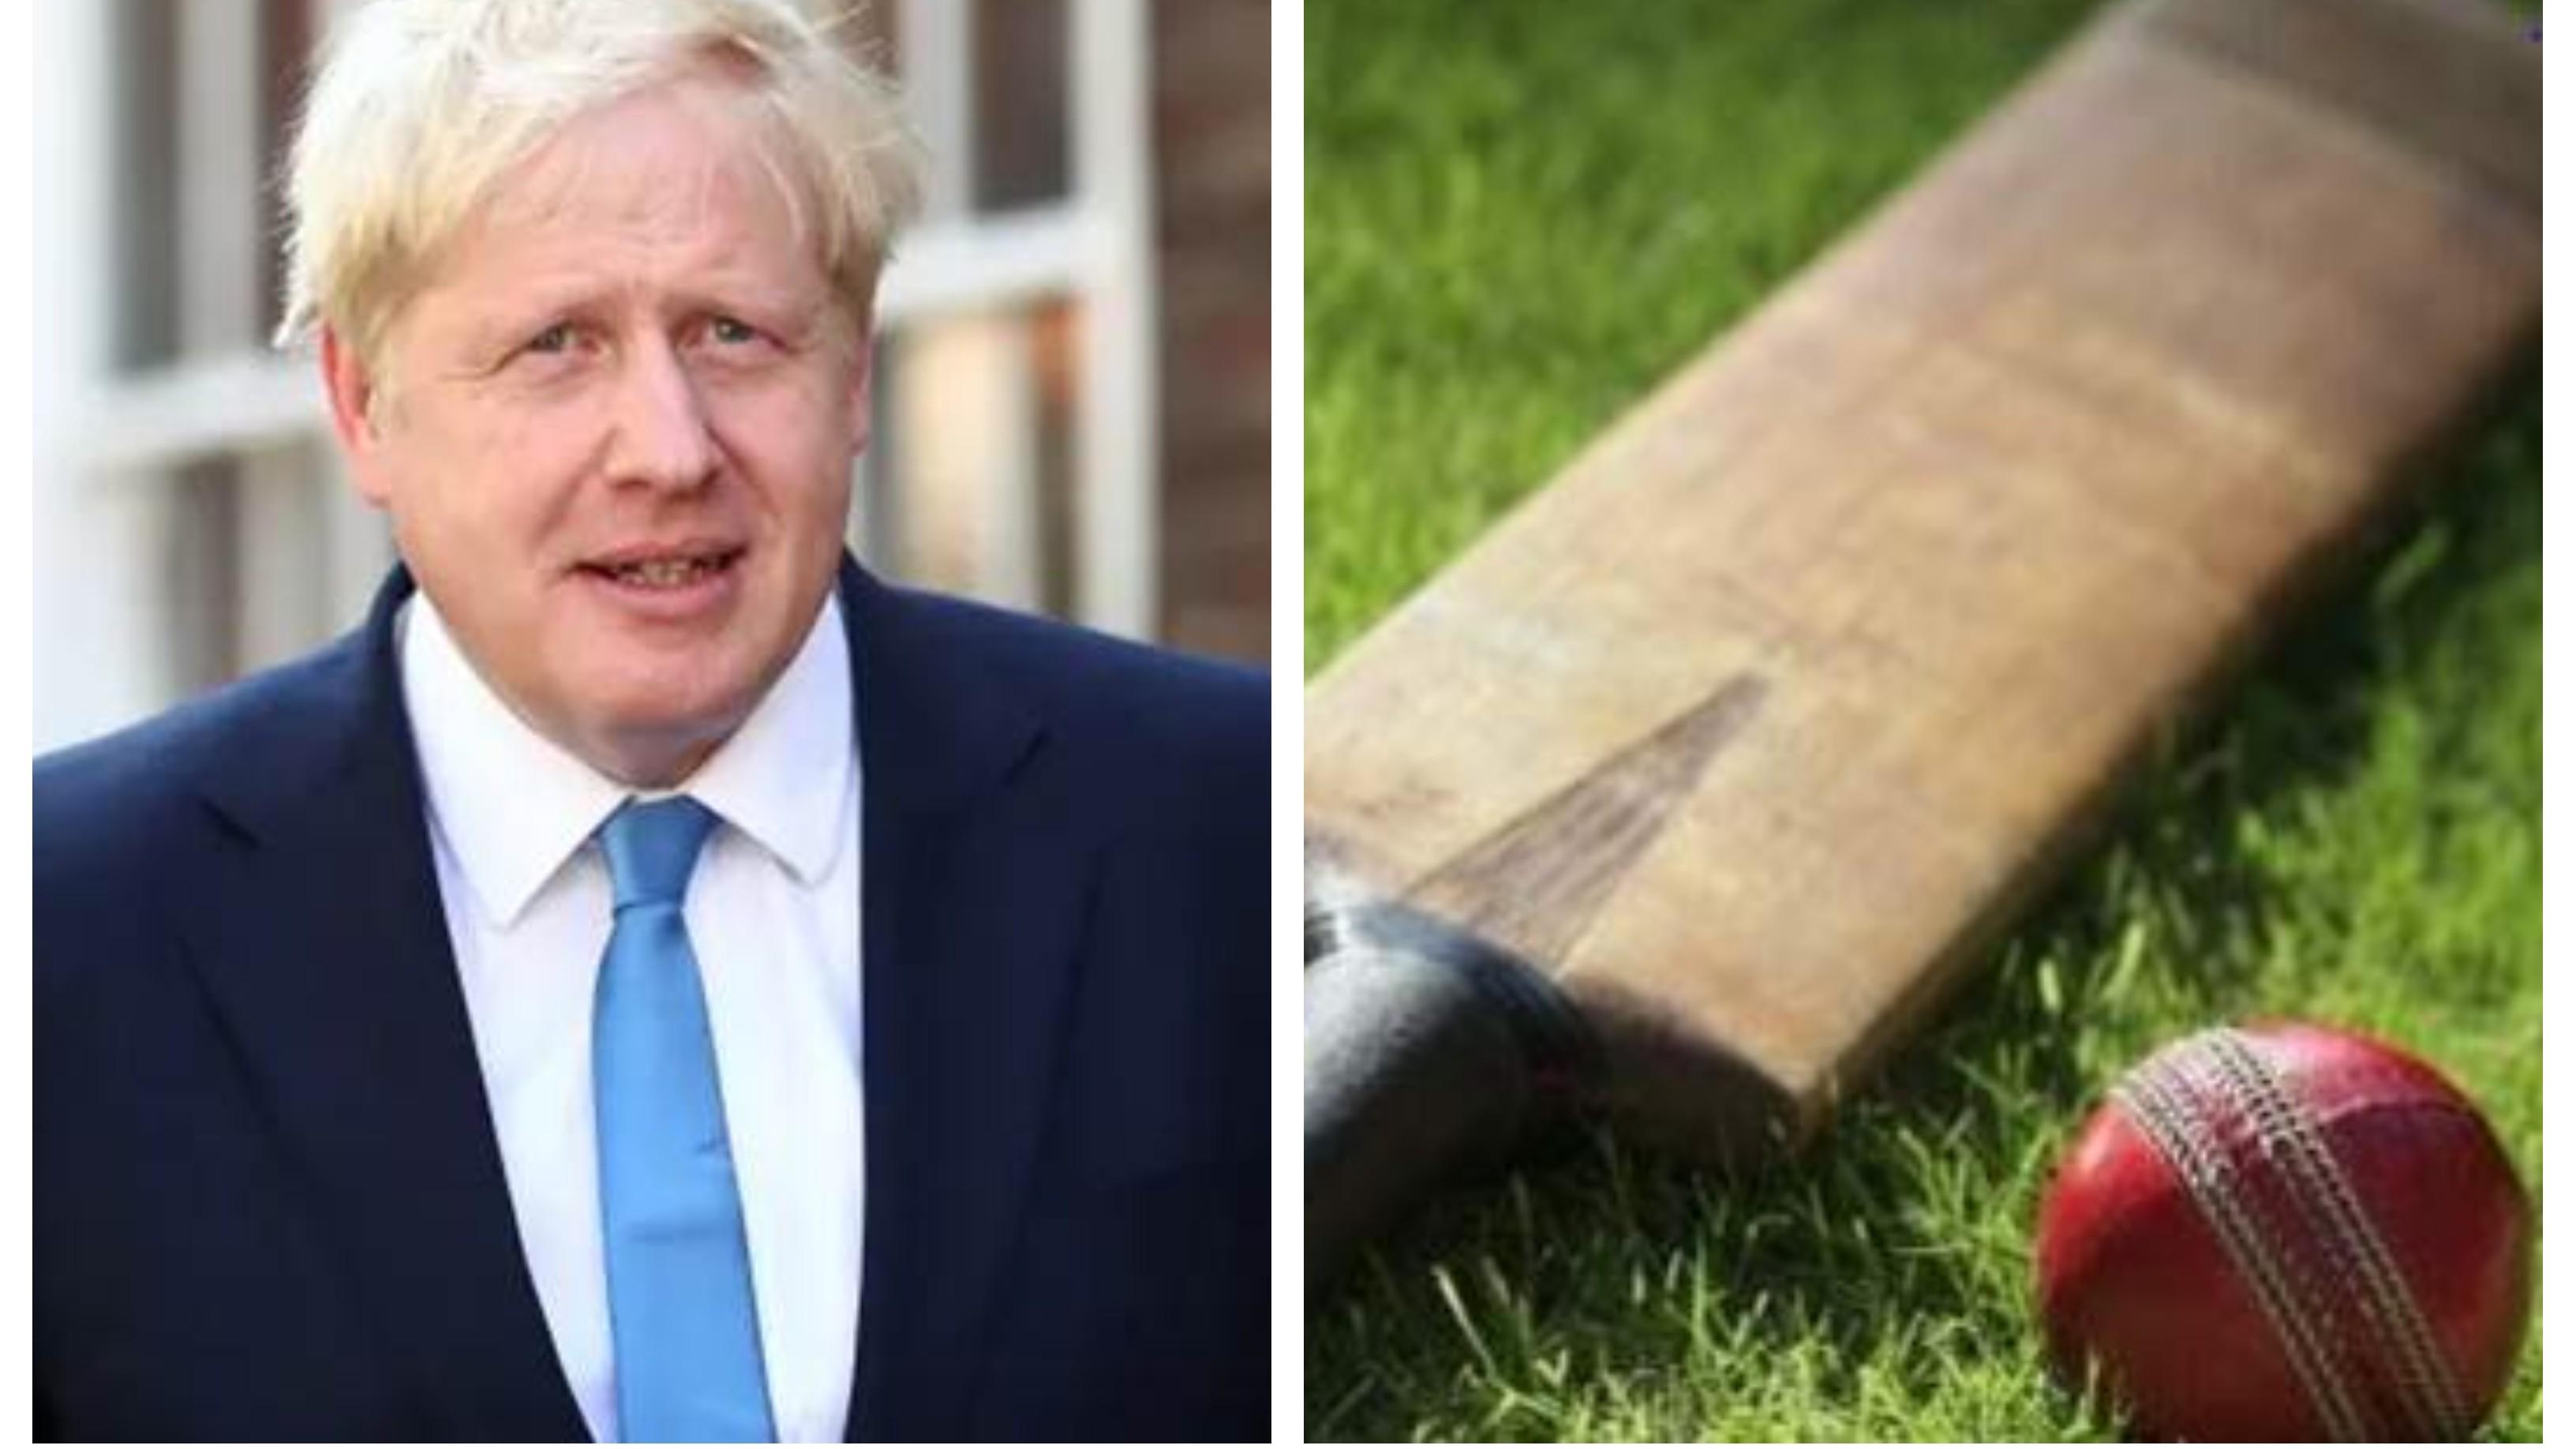 British PM Boris Johnson allows resumption of recreational cricket from July 11